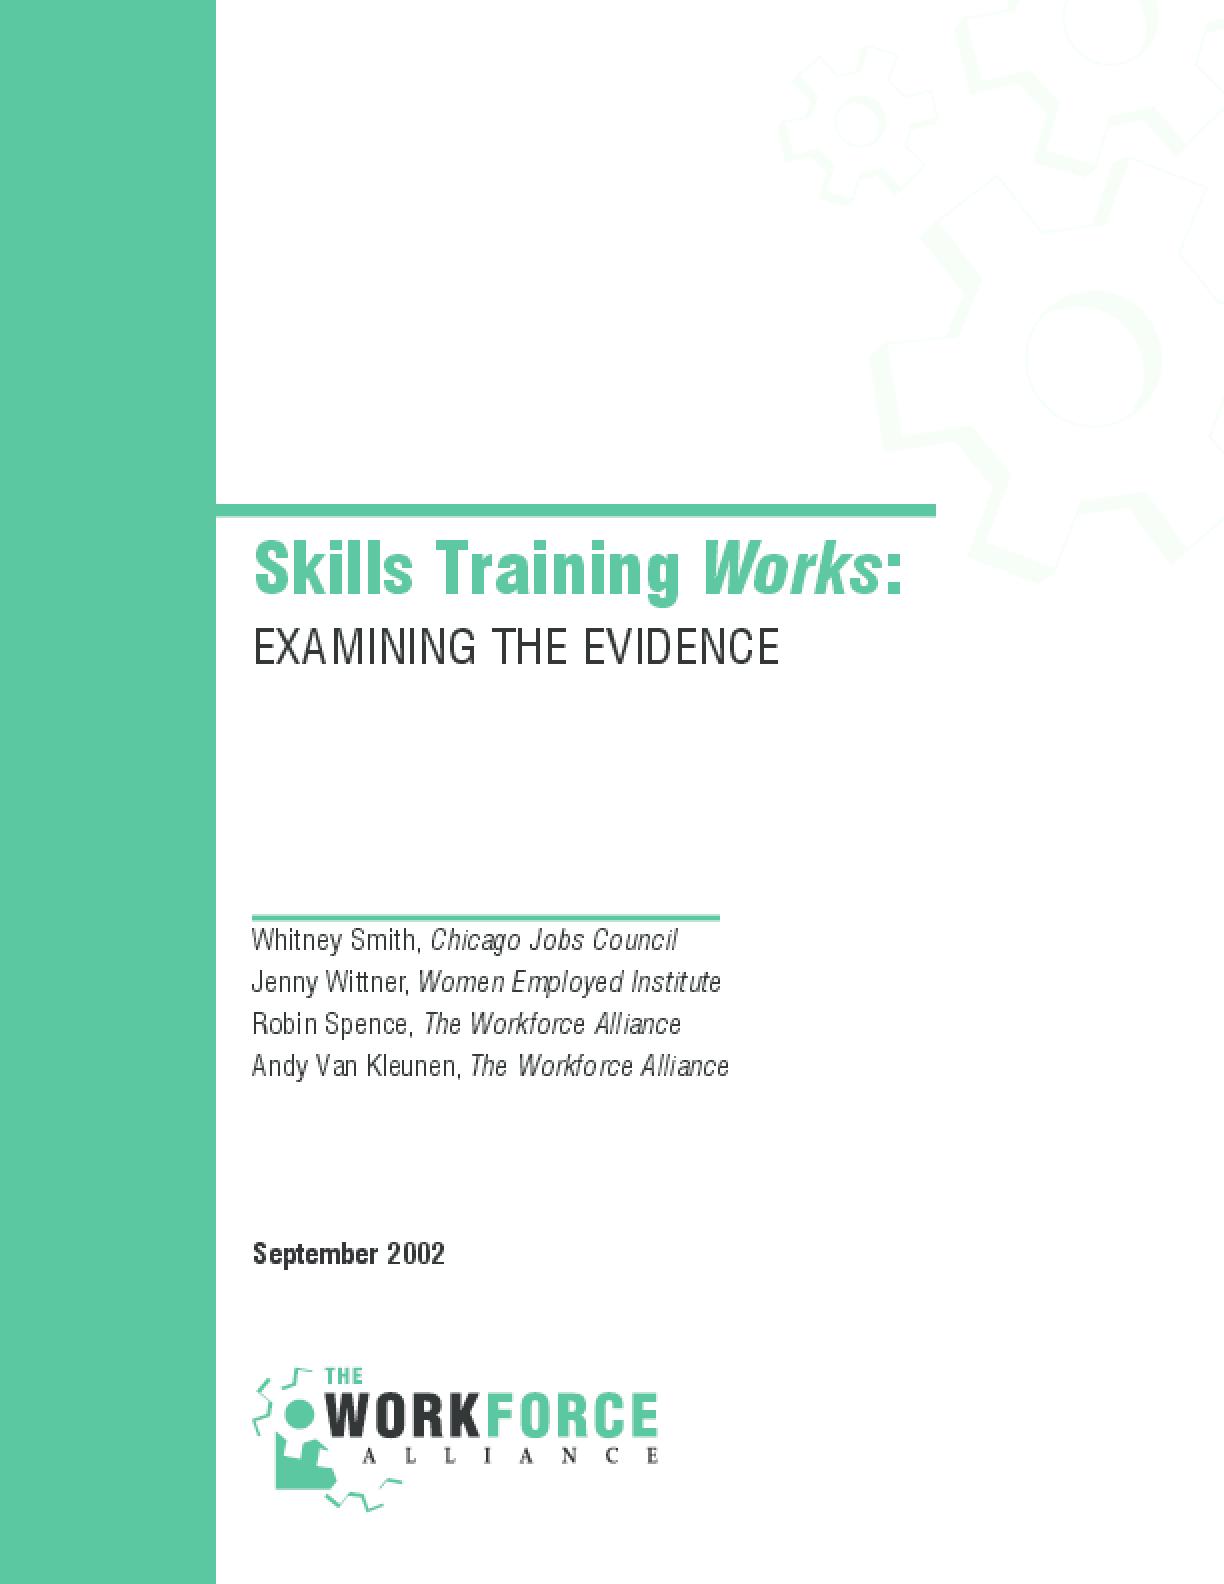 Skills Training Works: Examining the Evidence